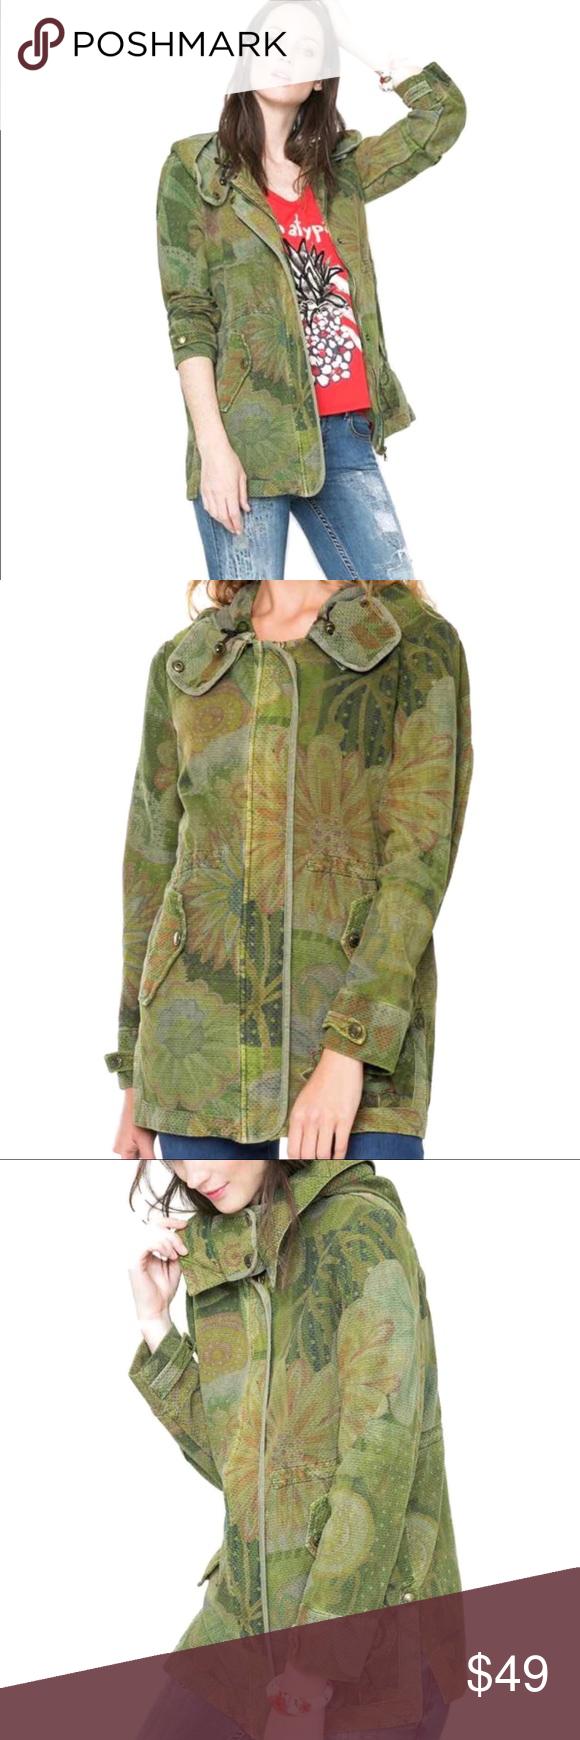 🌴Desigual Military Khaki Green Merci Jacket Desigual Khaki Green Merci Jacket…